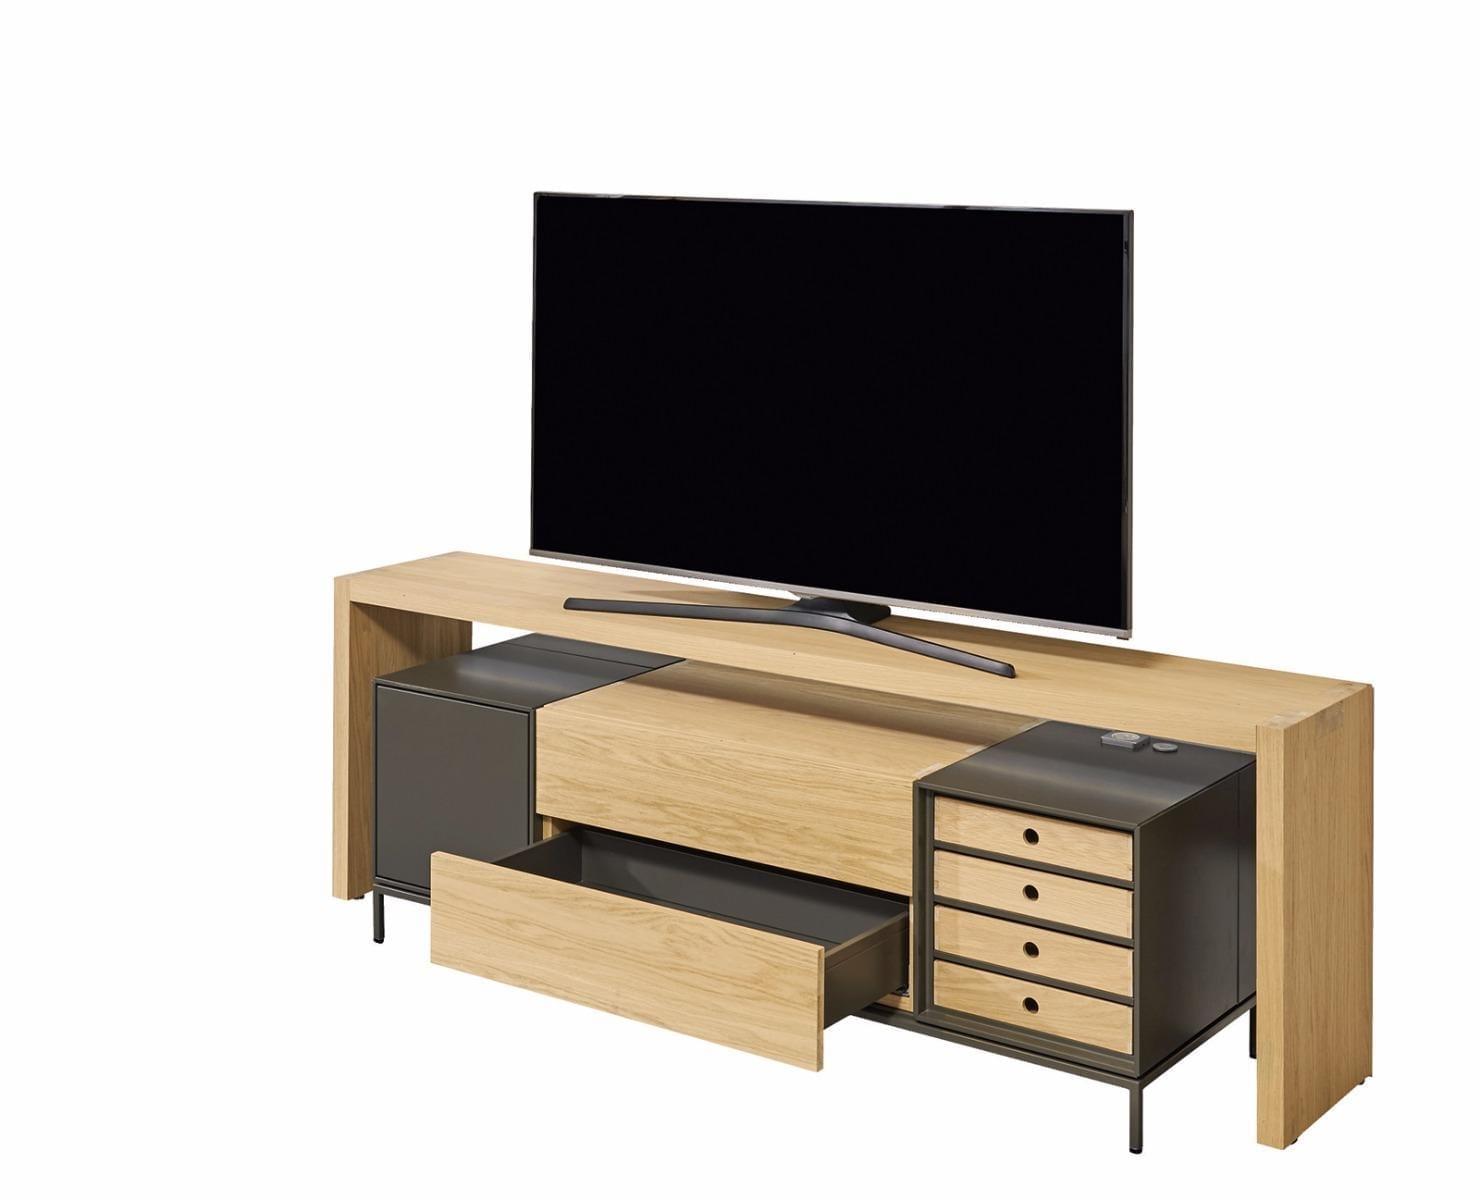 Tv Sideboard Hülsta Tv Lowboard Hülsta Schön Now By Hülsta Tv